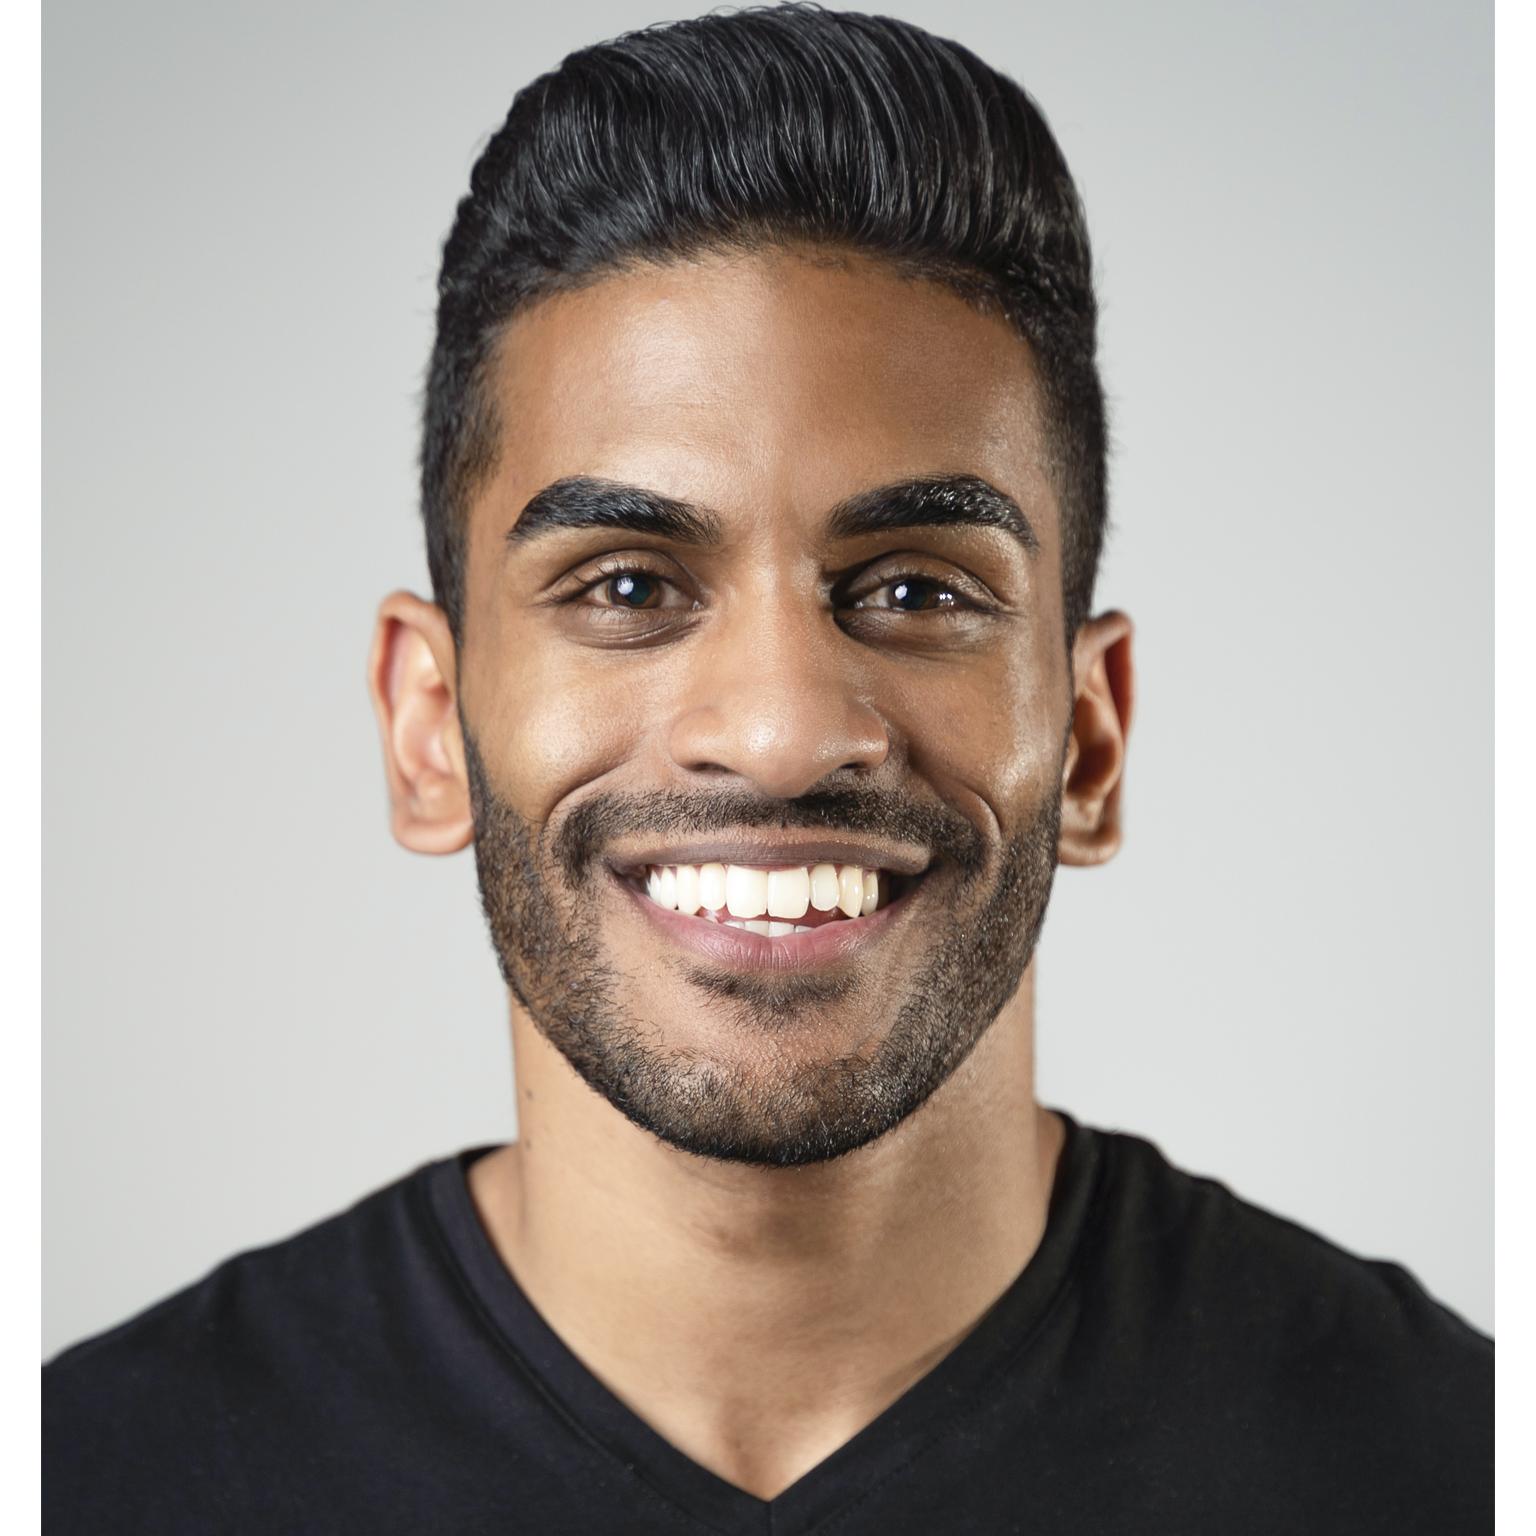 Toronto-Fitness-Model-Agency-Fitness-Casual-Commercial-Lahan-Sviaguru-Headshot